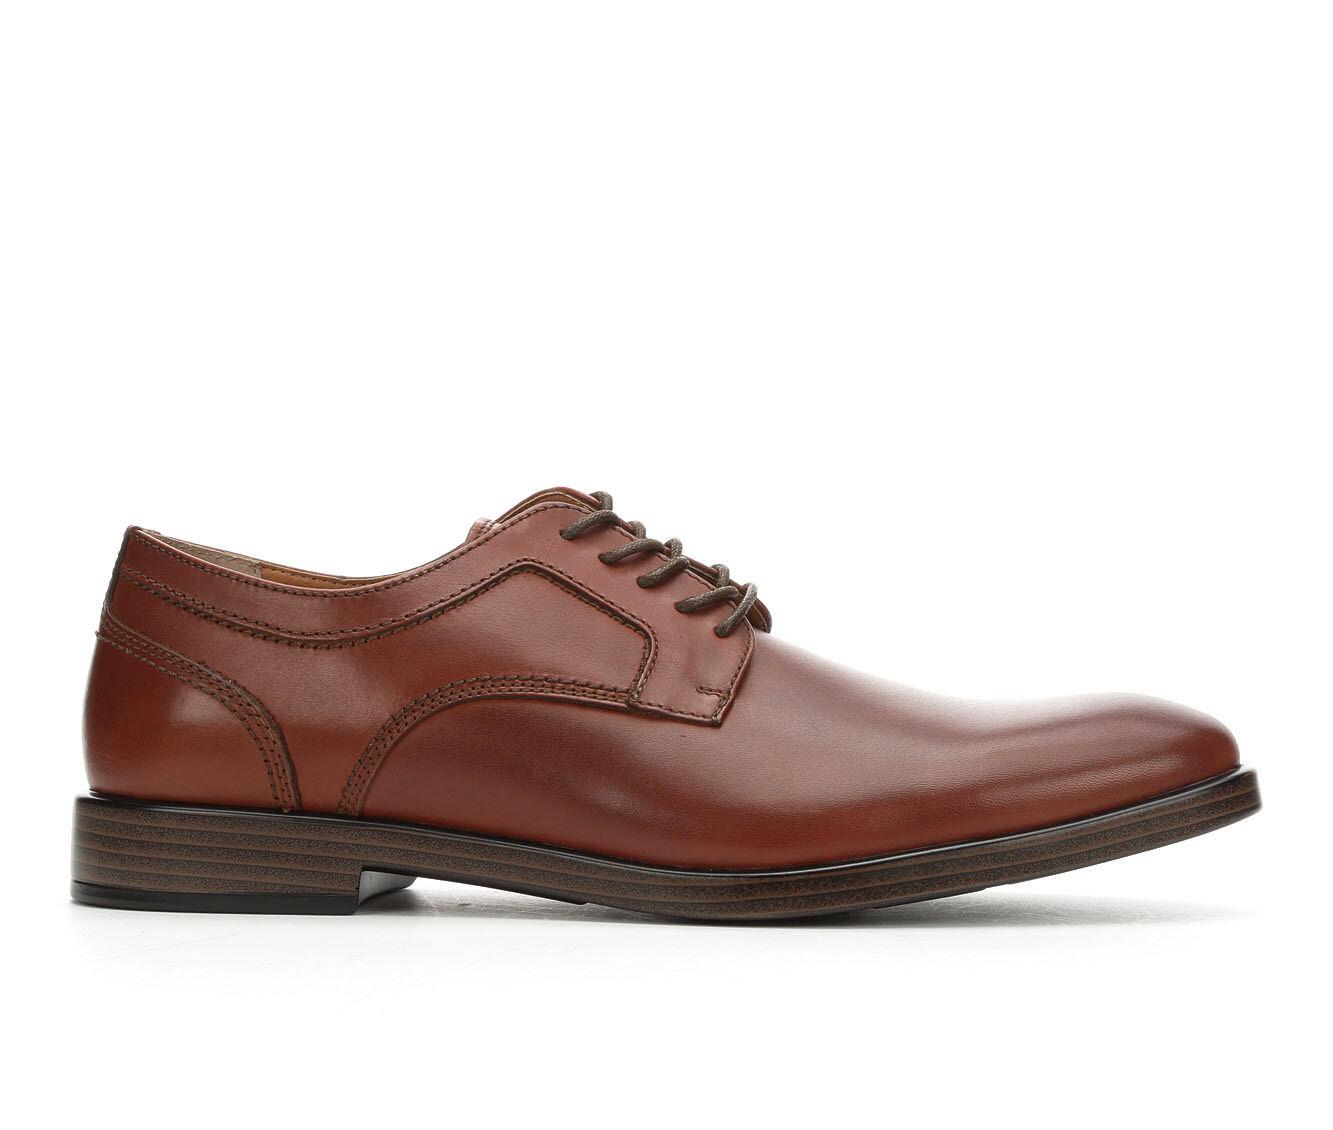 Men's Giorgio Brutini Shea Dress Shoes Tan